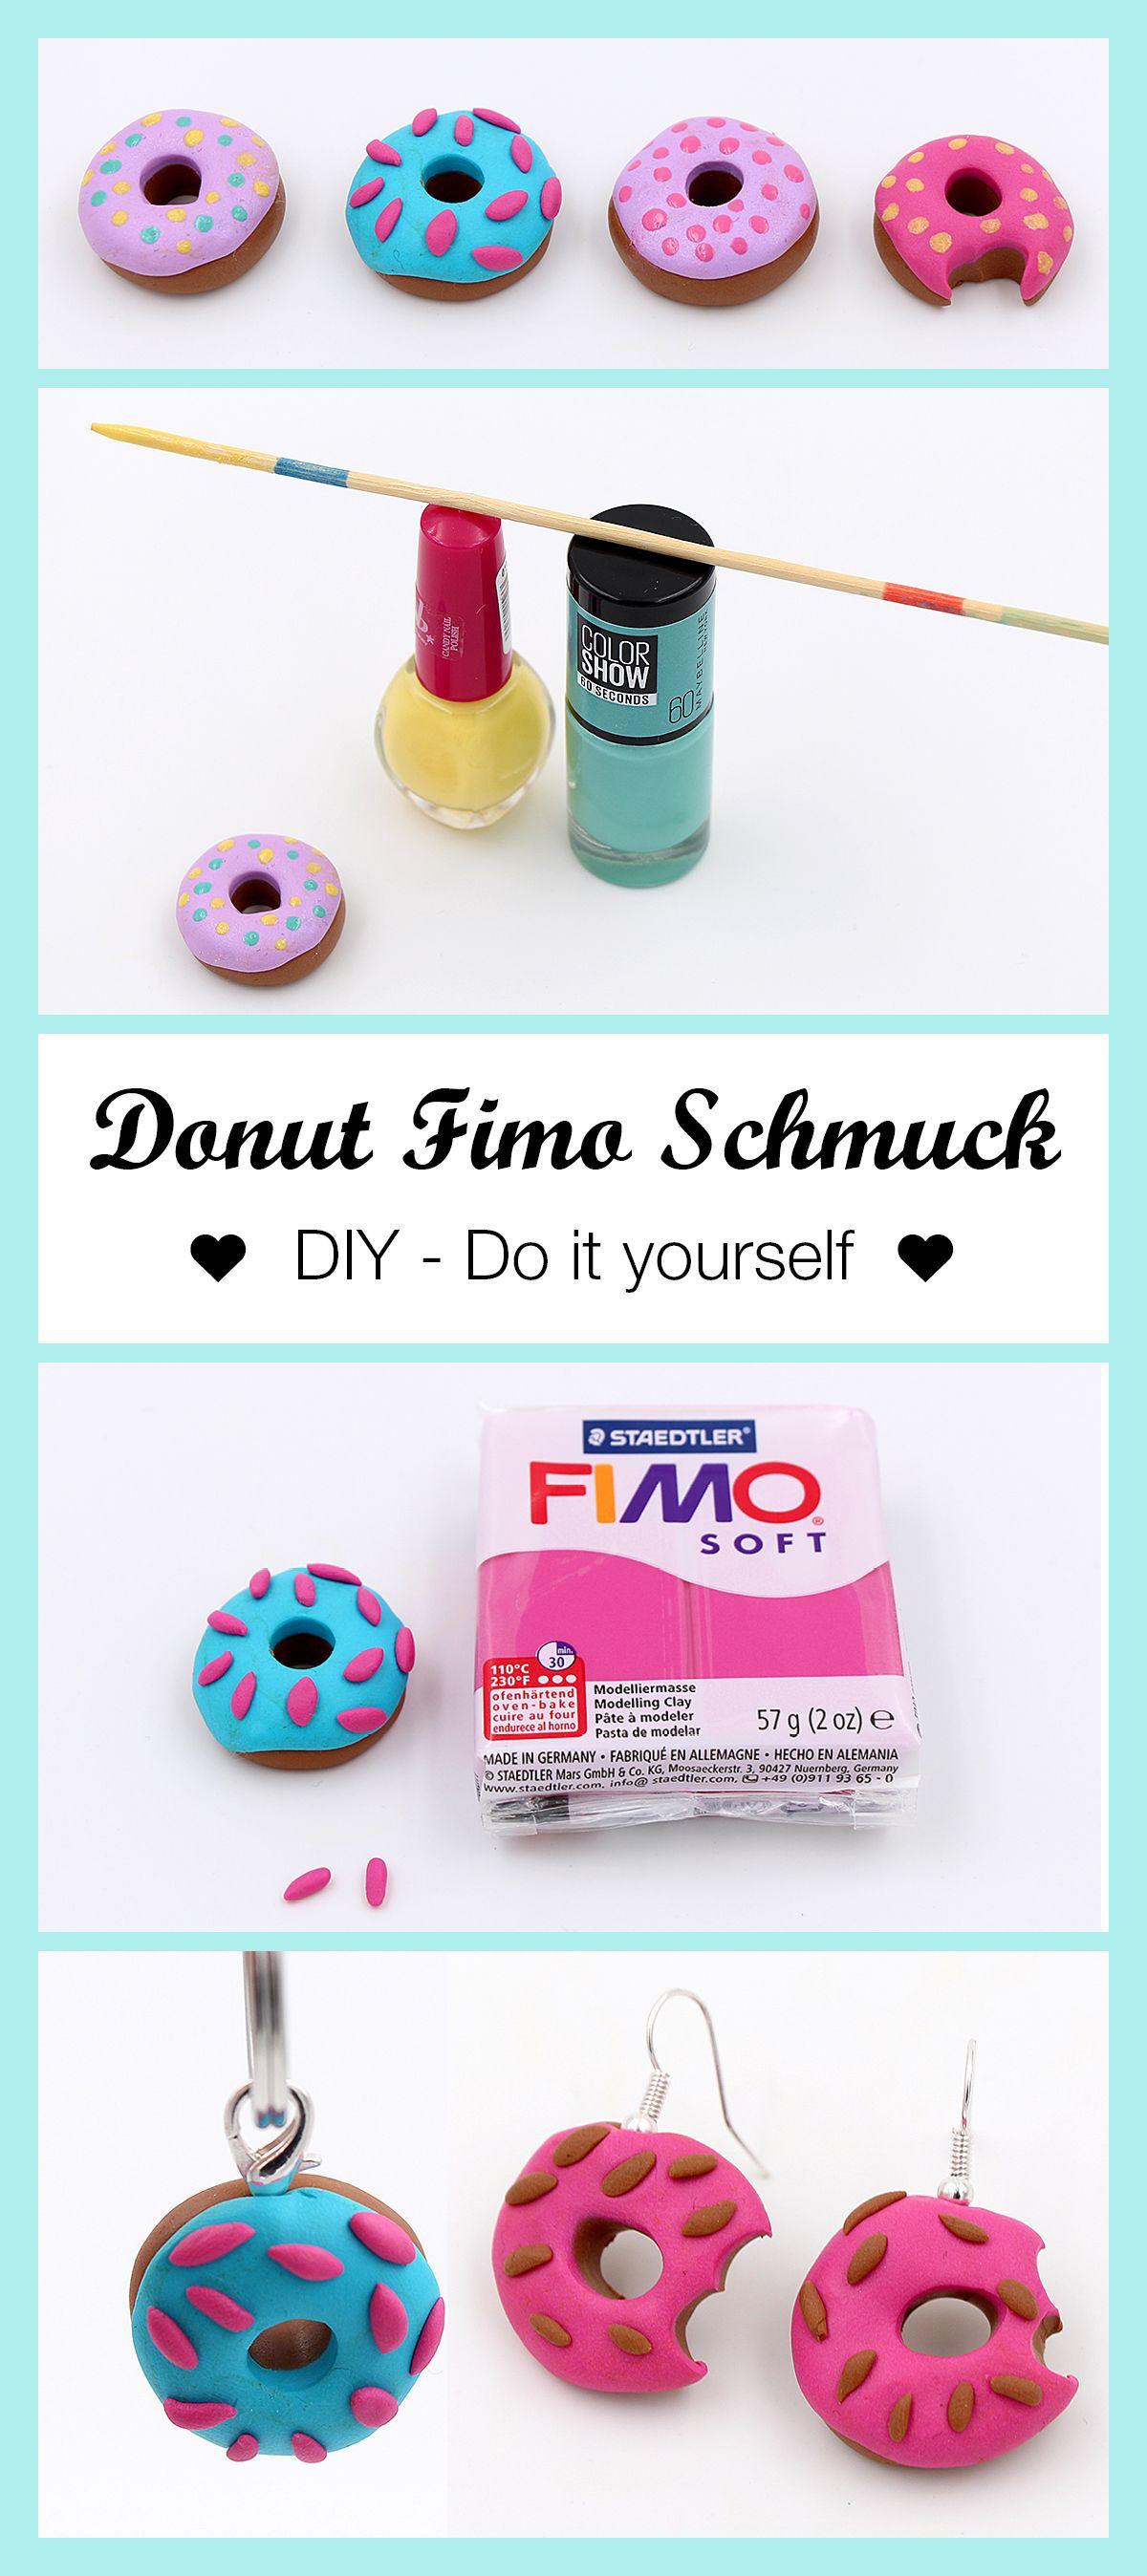 Schmuck Aus Fimo Donuts Selber Machen Diy Anleitung